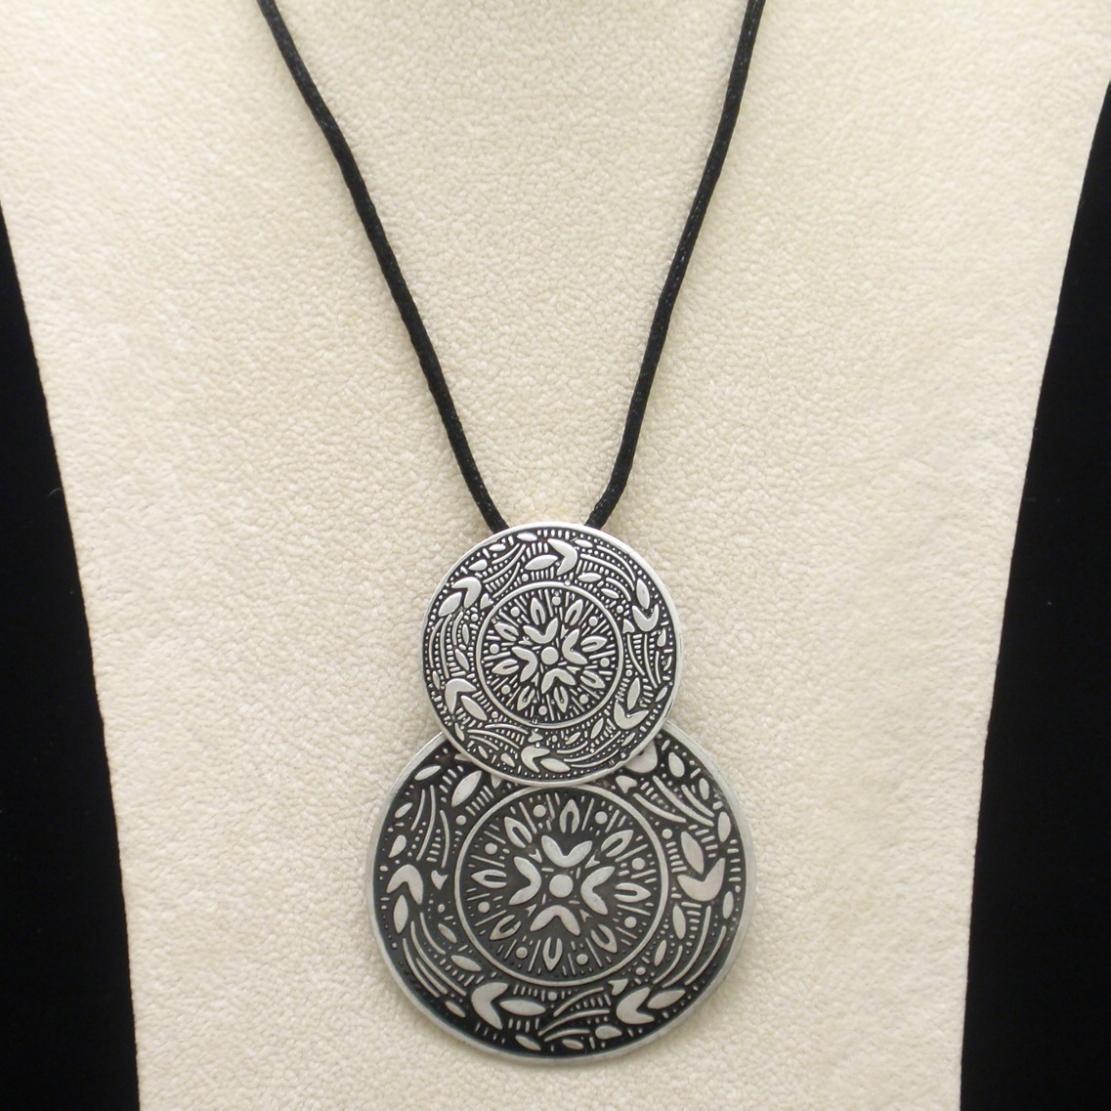 Eloxal Pendant Necklace Double Discs on Cord Vintage Aluminium